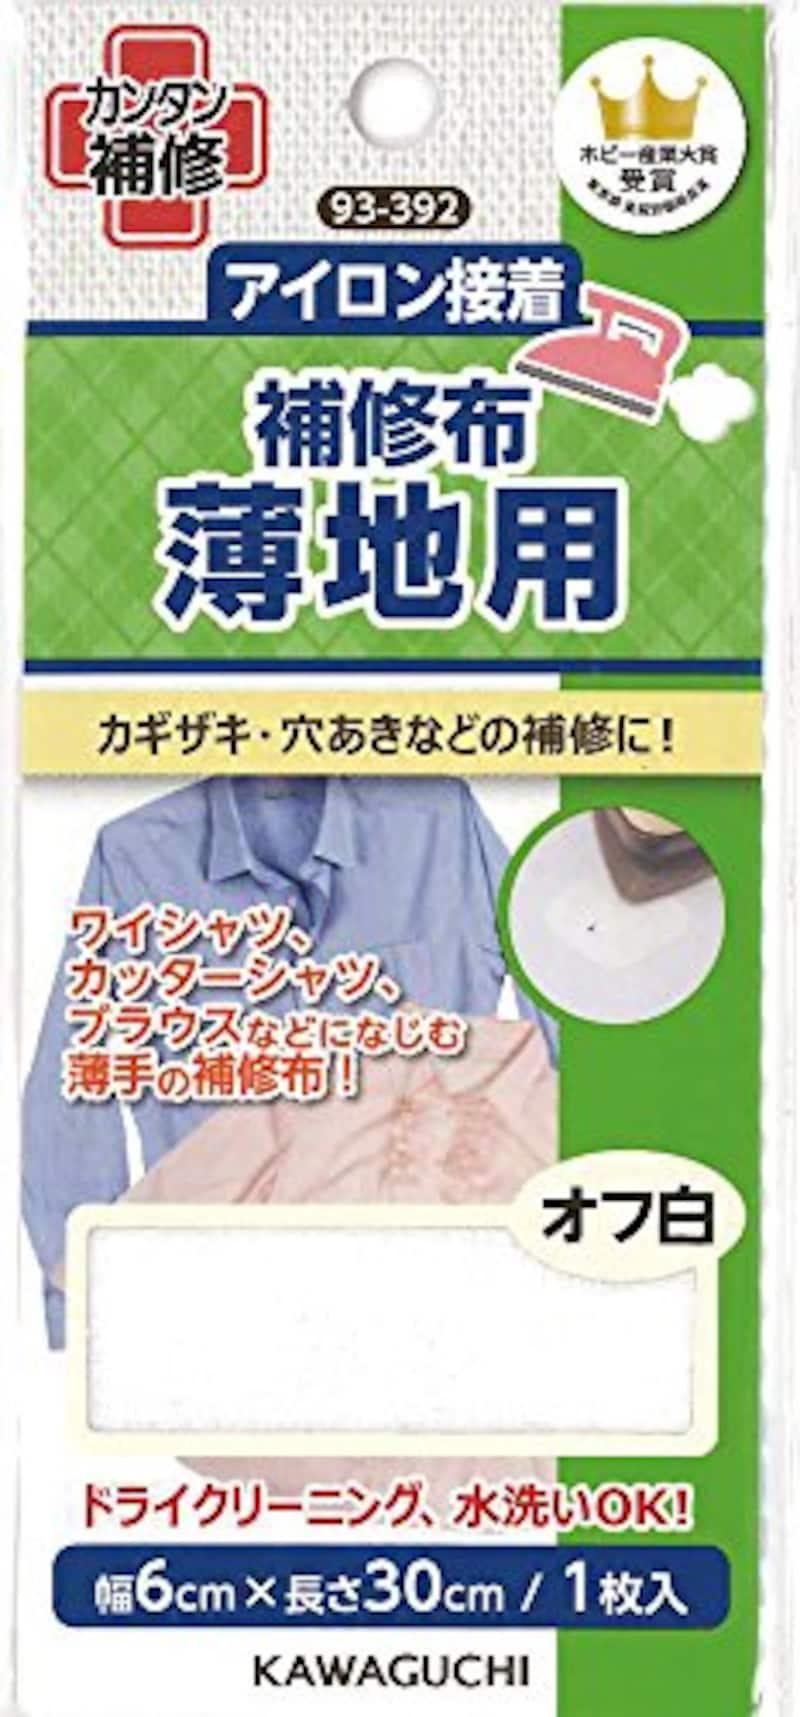 Kawaguchi(カワグチ),補修布